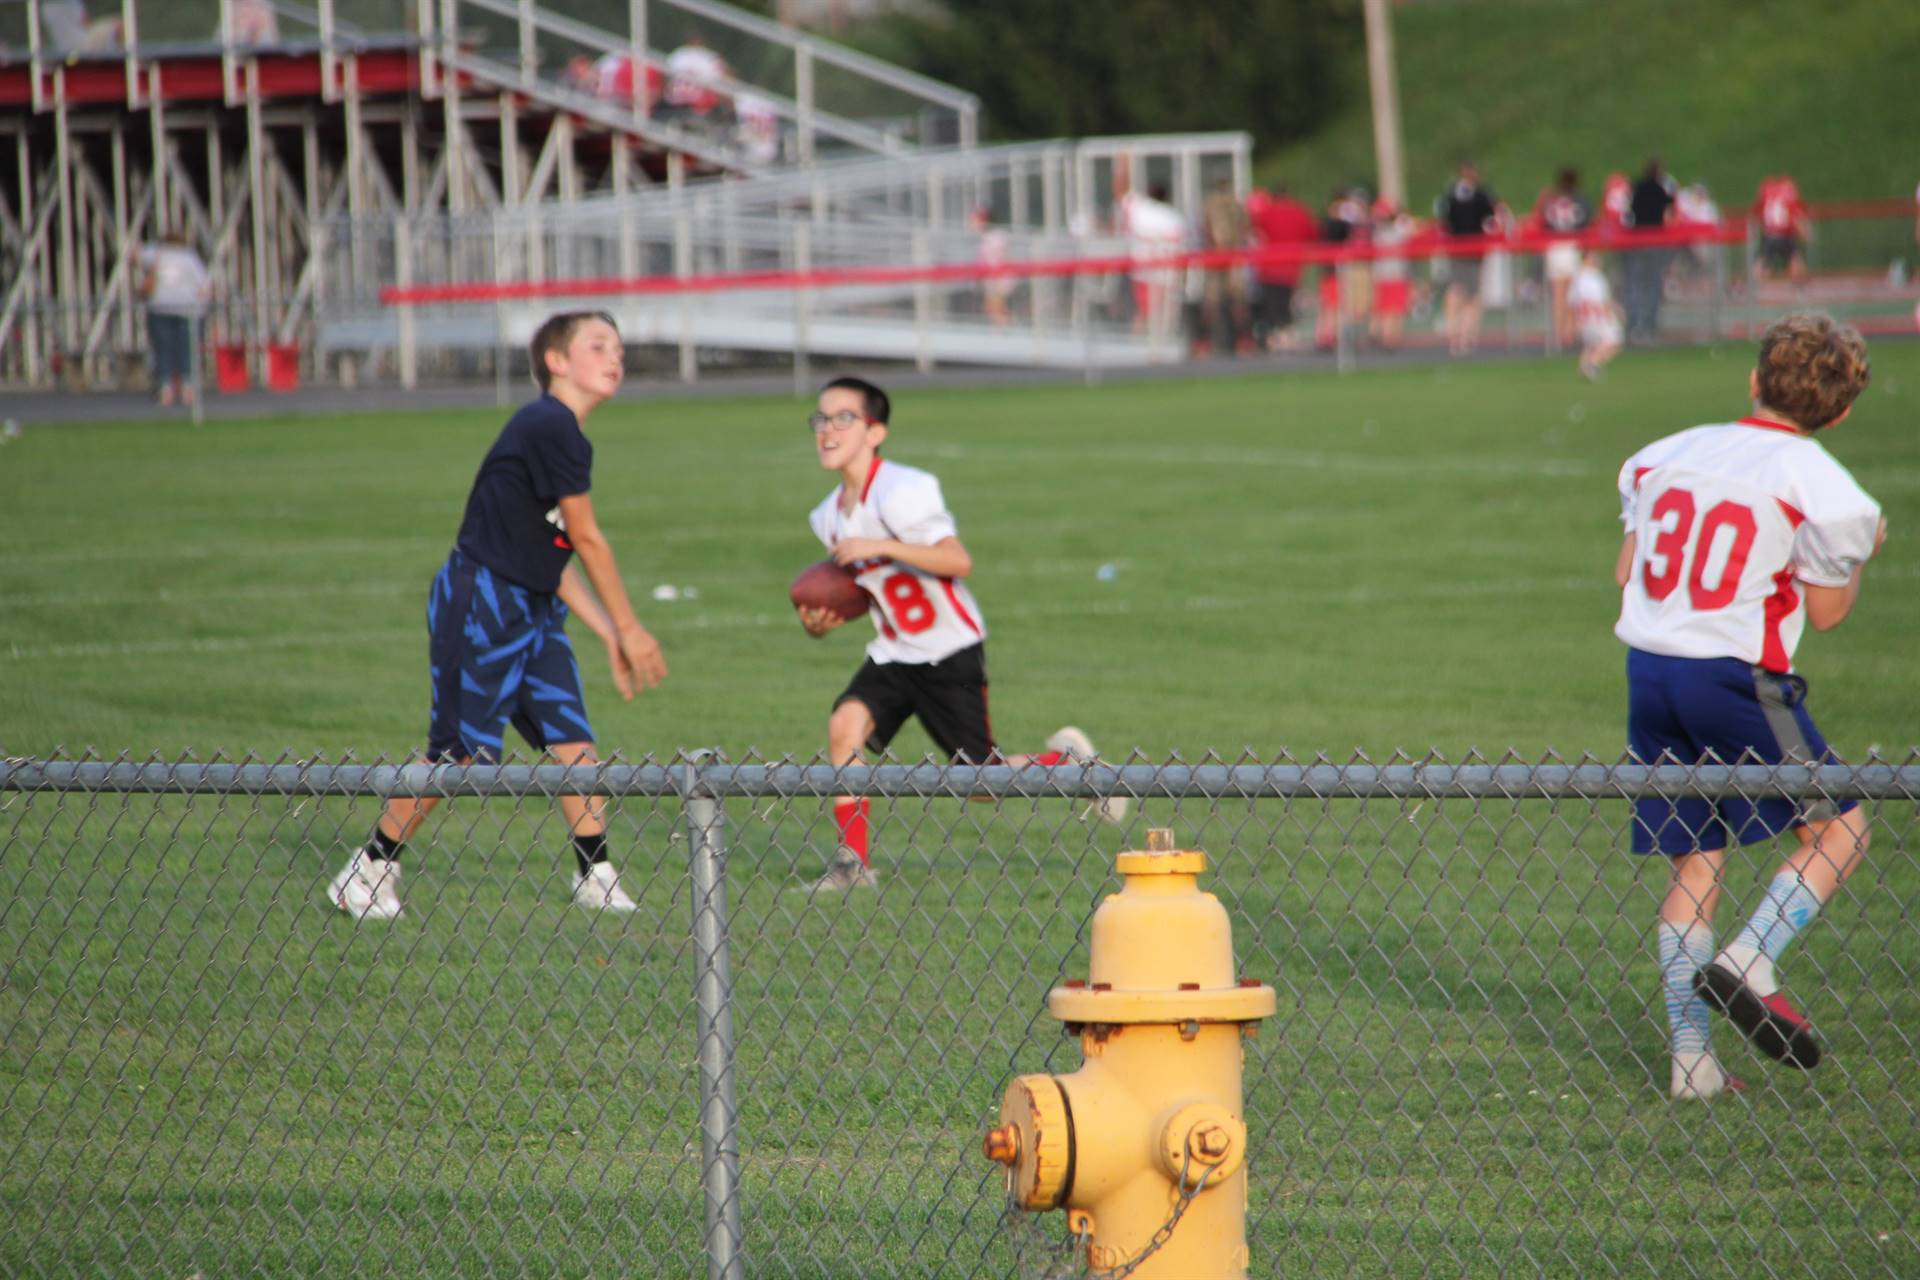 boys playing football next to c v stadium